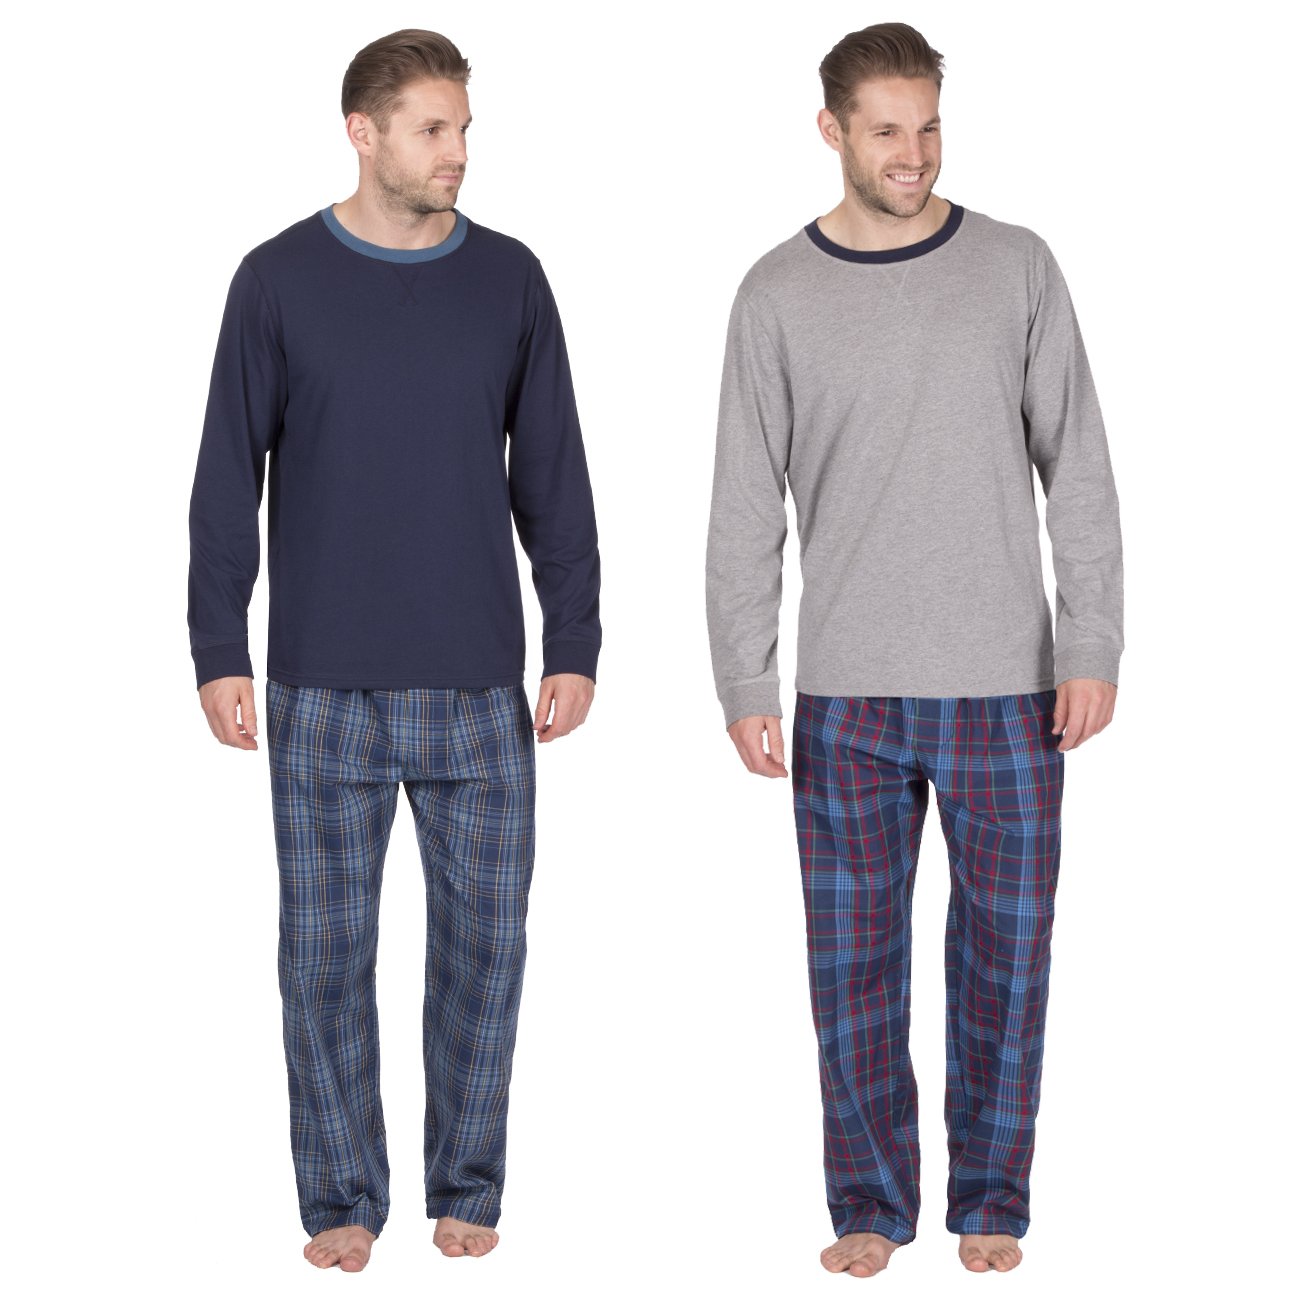 Mens Soft Long Sleeved Thermal Fleece Top Check Pant Pyjamas Set